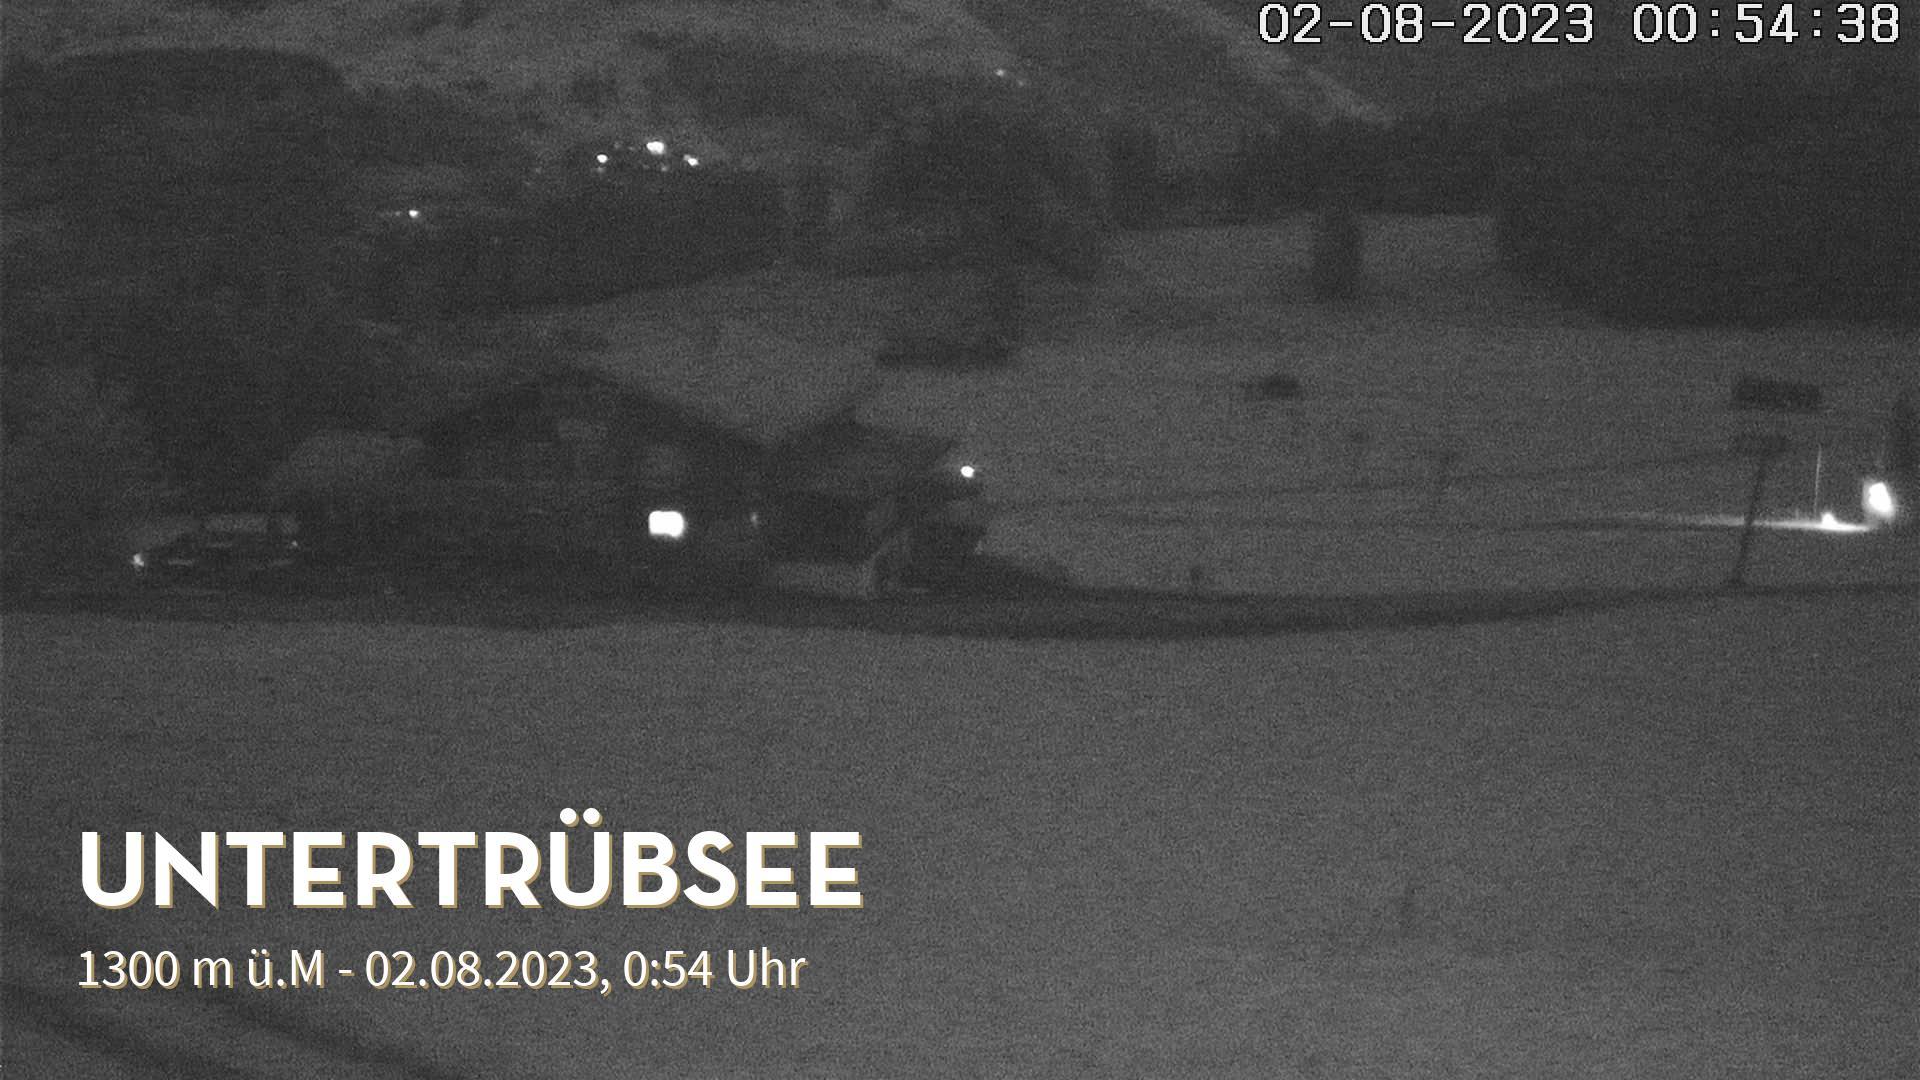 Engelberg webcam - Untertruebsee